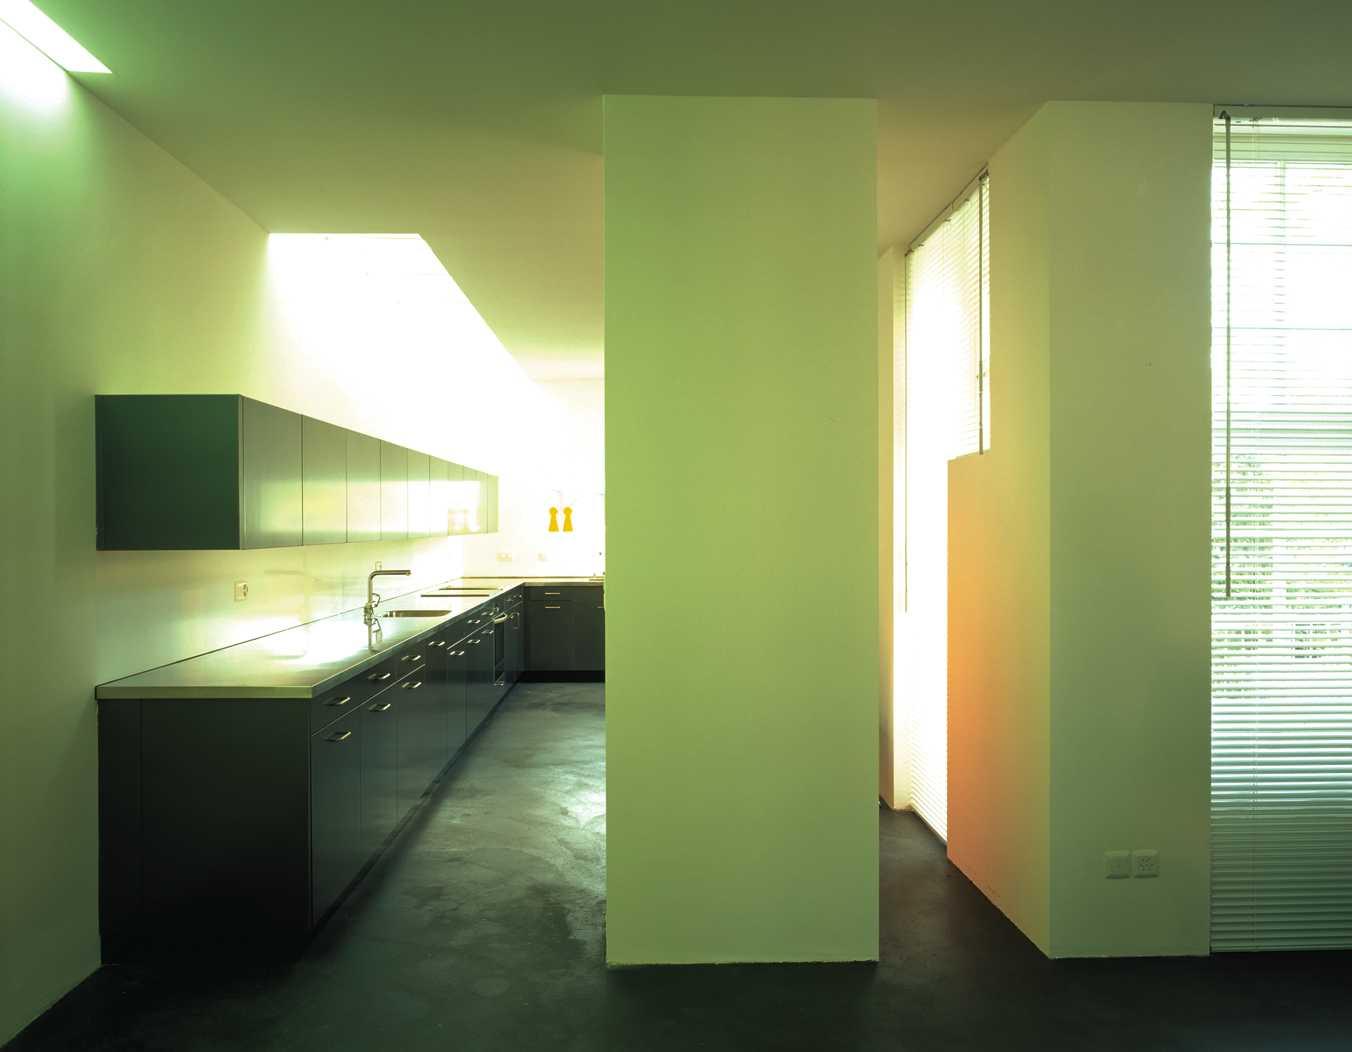 Ferrara Architekten Ag Fertiggestellt Steinenring 58